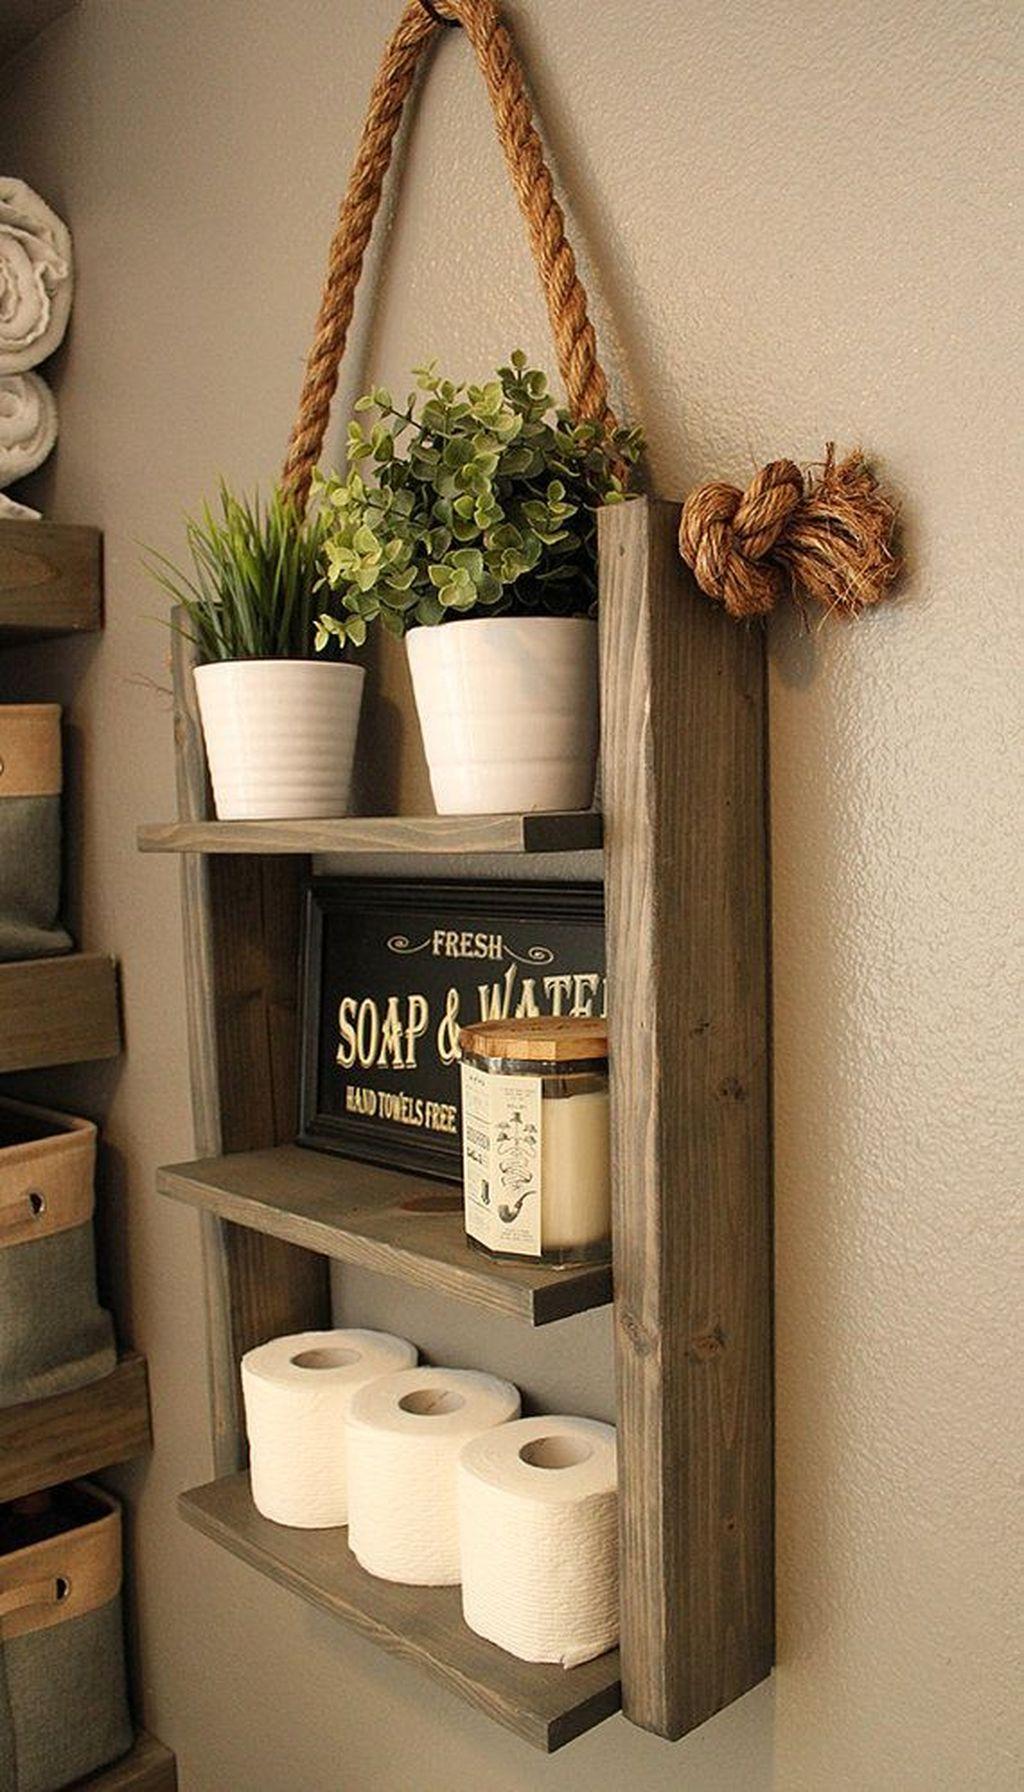 Fascinating Rustic Bathroom Decor Ideas You Must Copy 35